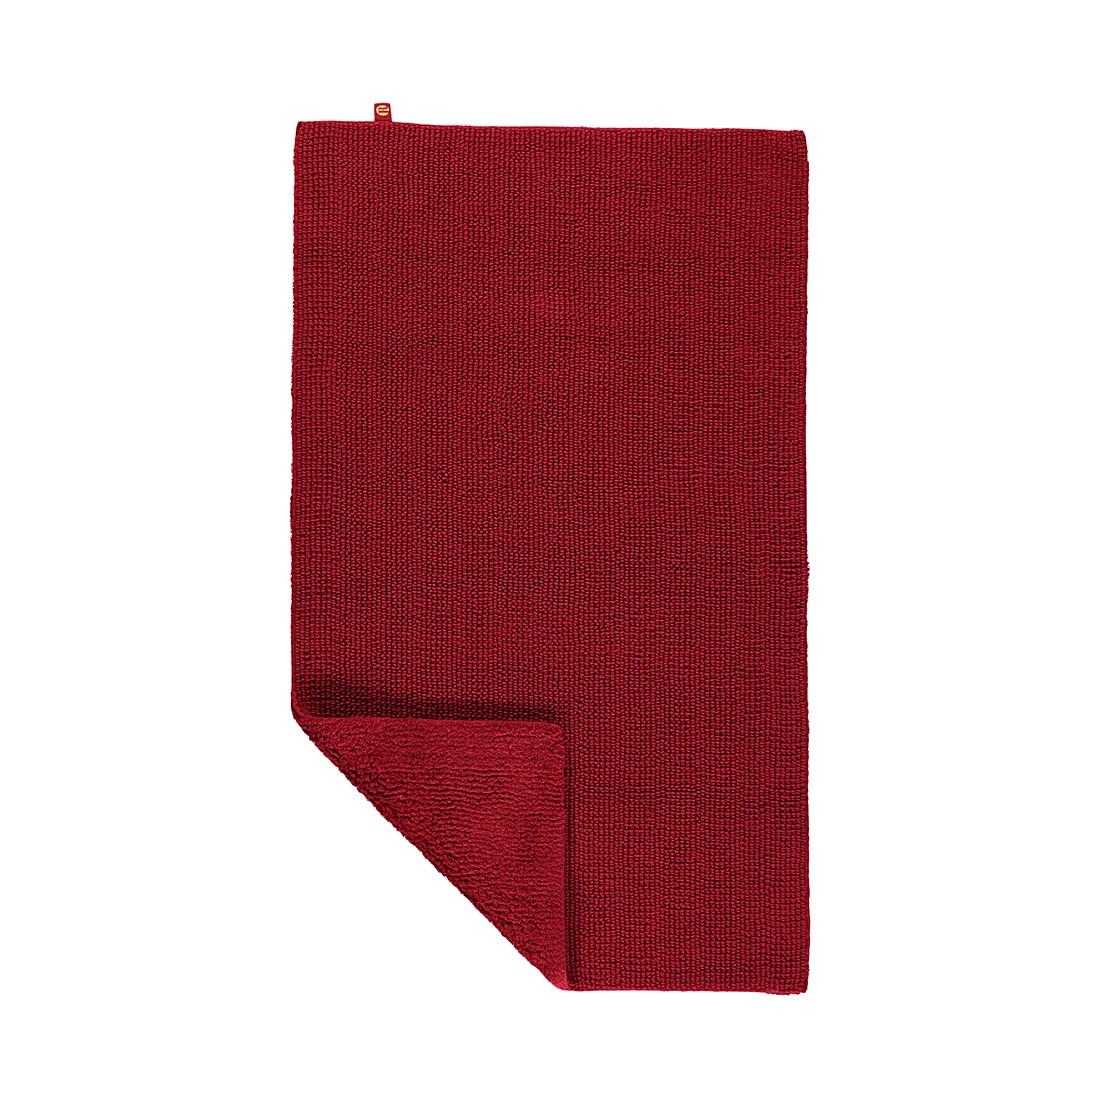 Badteppiche Pur - 100% Baumwolle cardinal - 349 - 70 x 130 cm, Rhomtuft